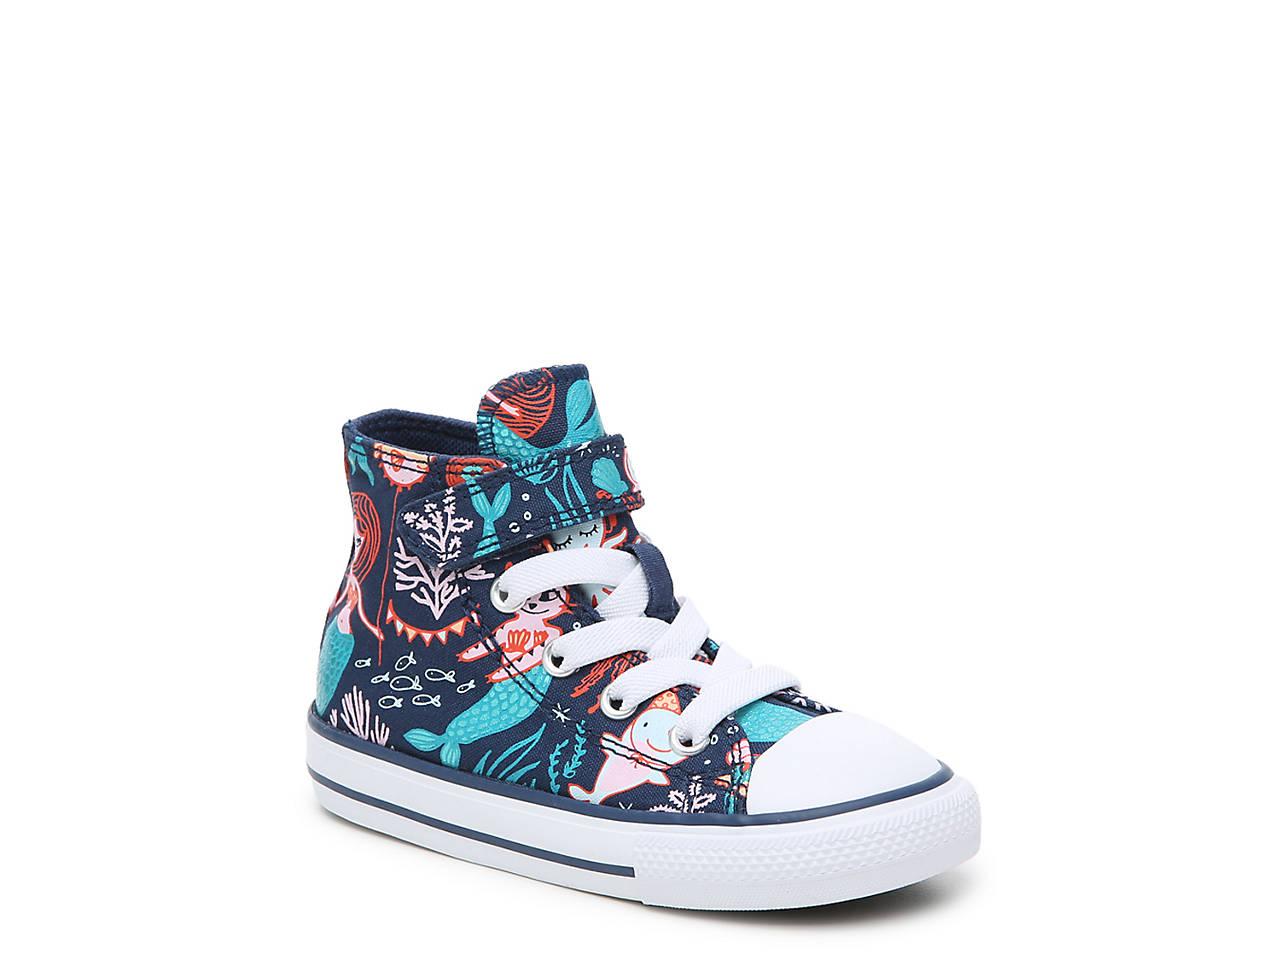 Converse Chuck Taylor All Star 1V Mermaid High Top Sneaker